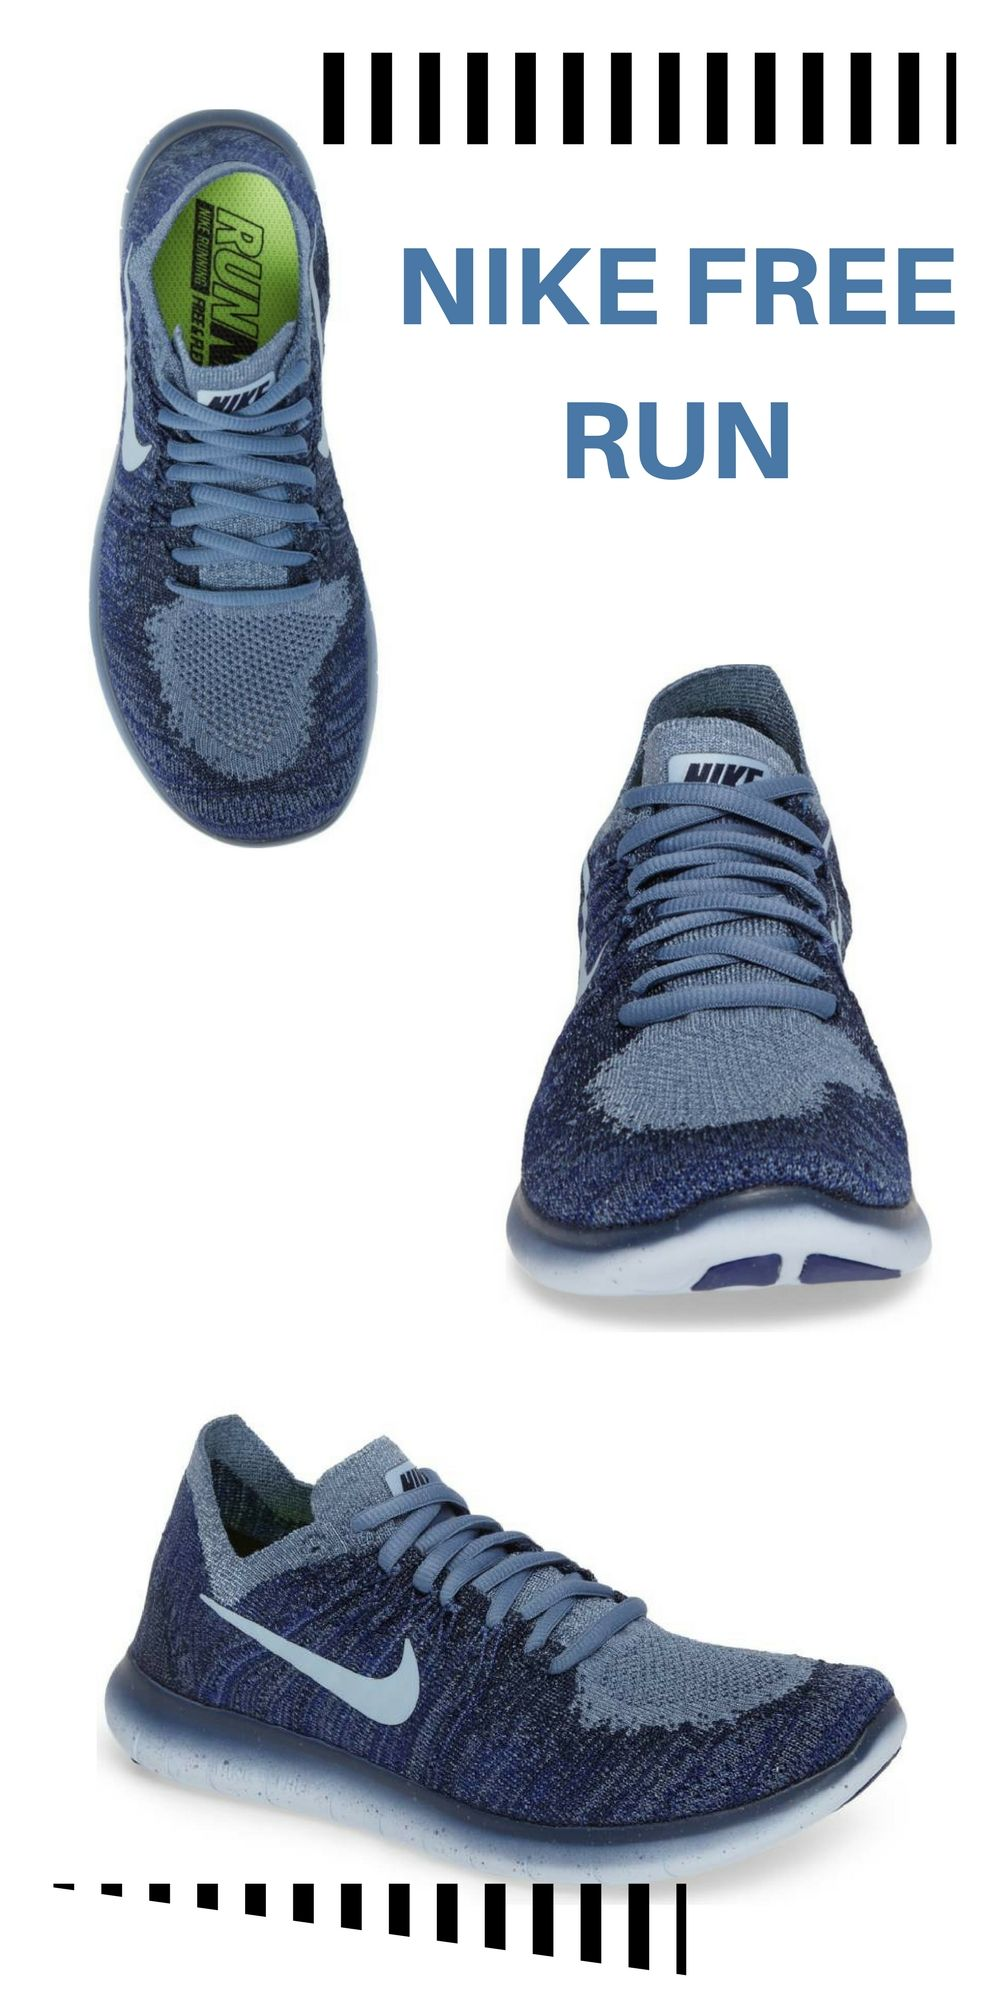 2f277382 #ad Nike Free Run, Sporty, Women, Blue, Red, Black, White, Trendy, Running  Shoe, Fly Knit